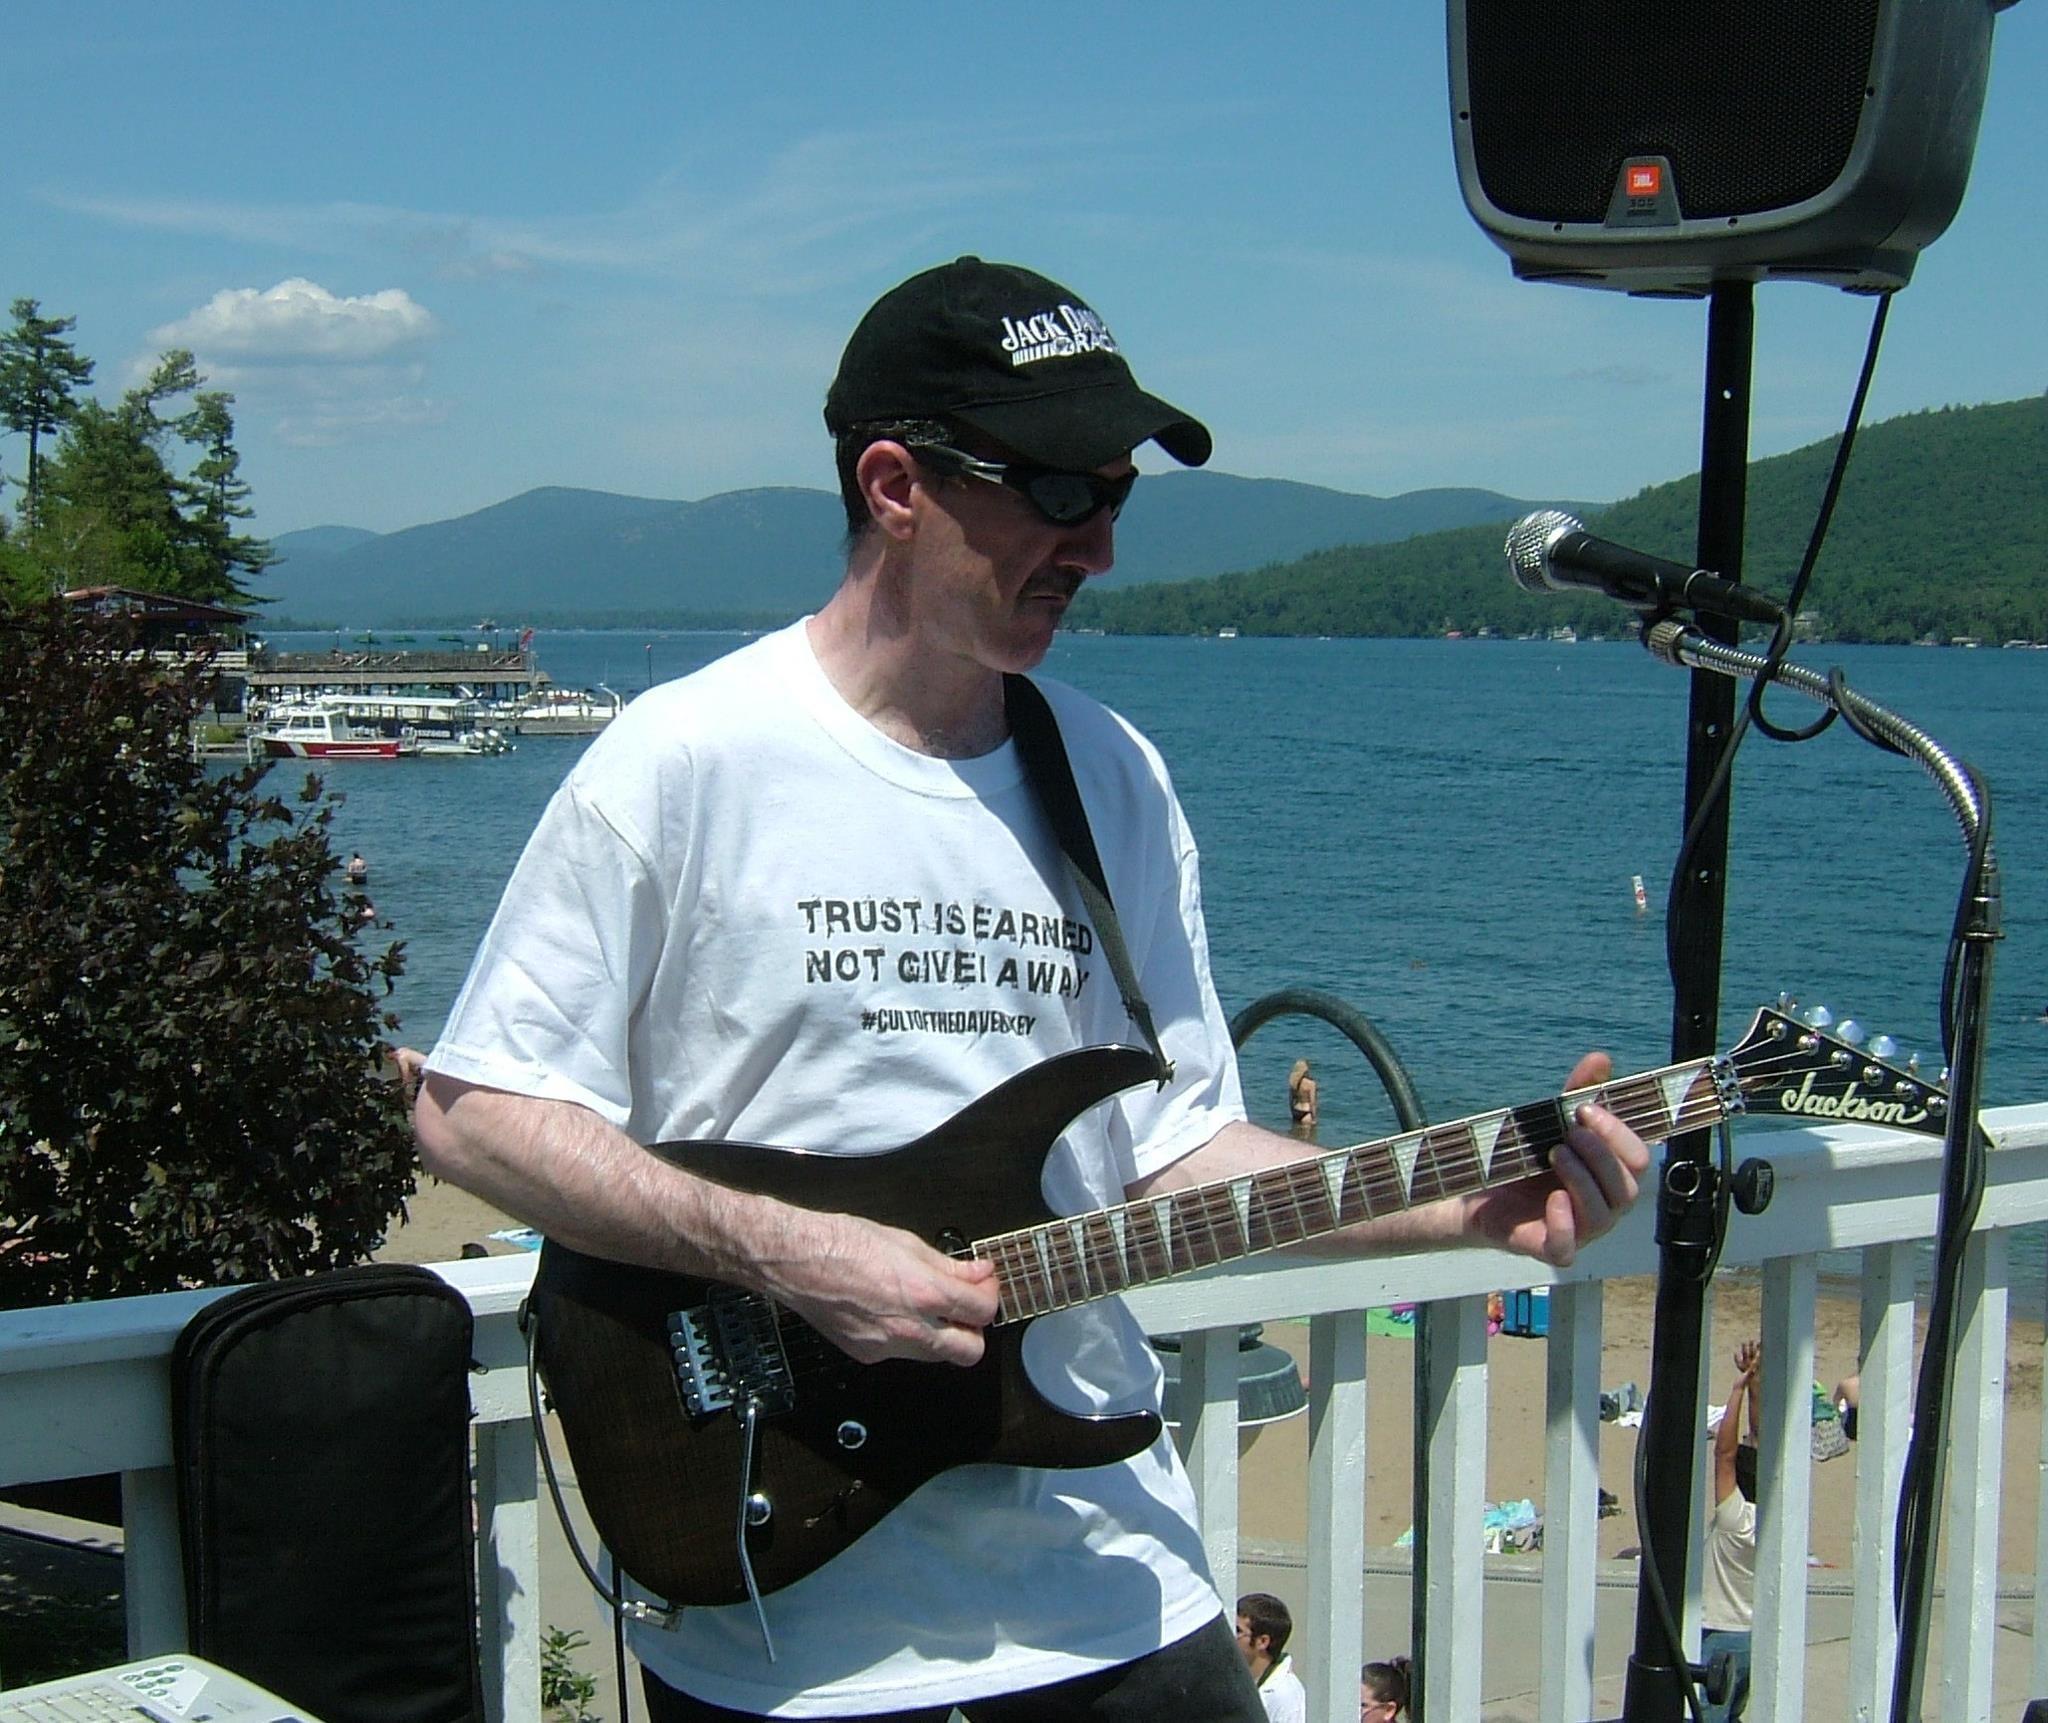 Scott Price wearing a #cultofthedavekrykey t-shirt